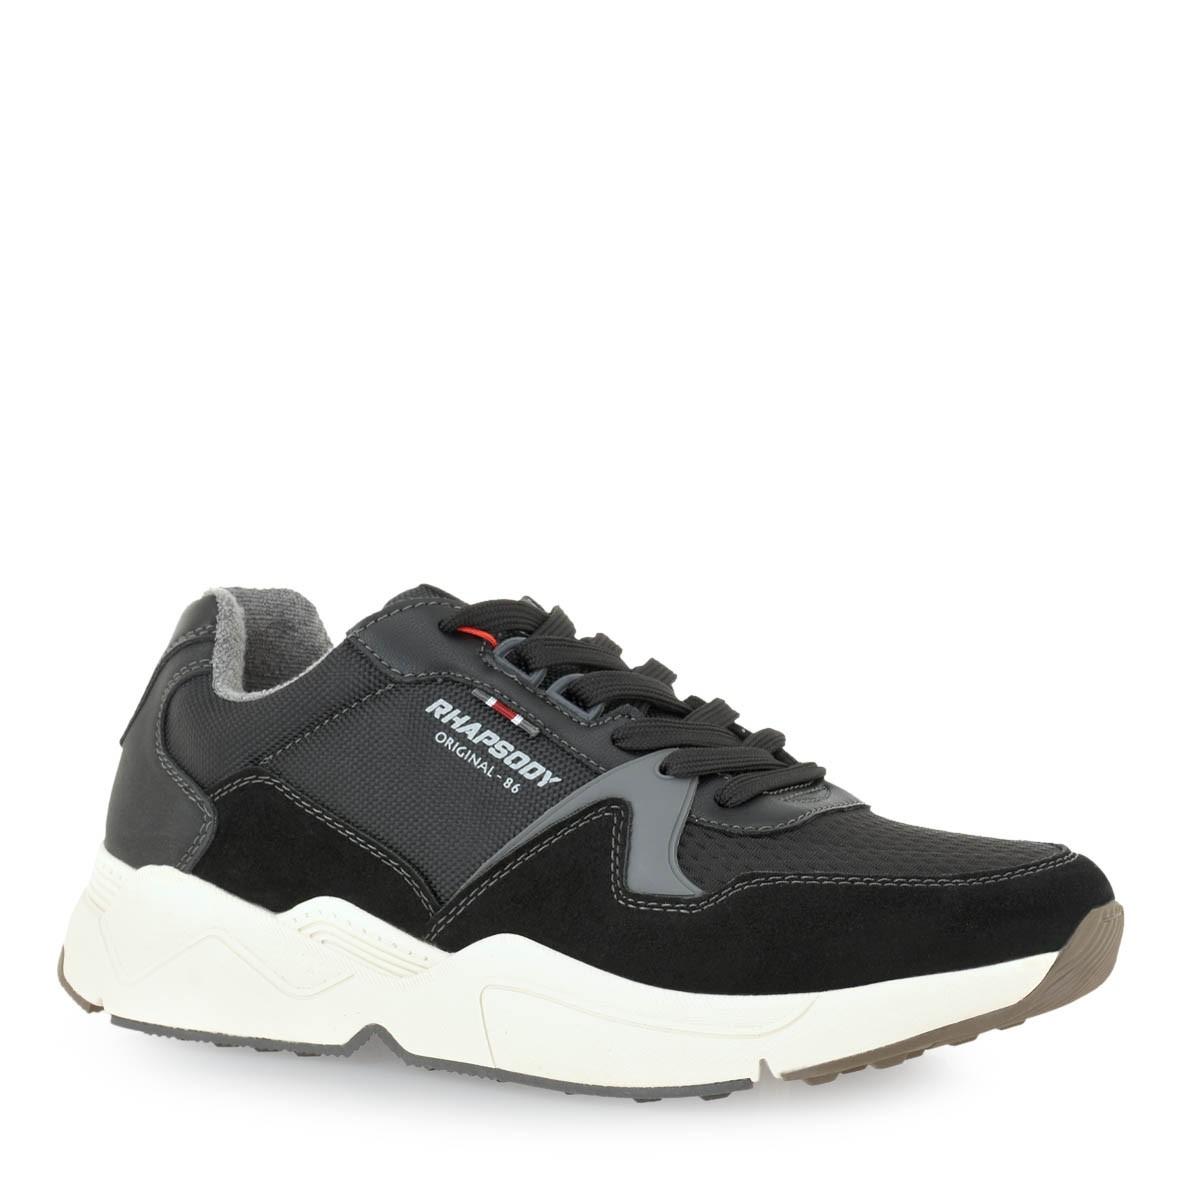 RHAPSODY Ανδρικά Παπούτσια Sneakers 206-909443 Mαύρο L589S2062172